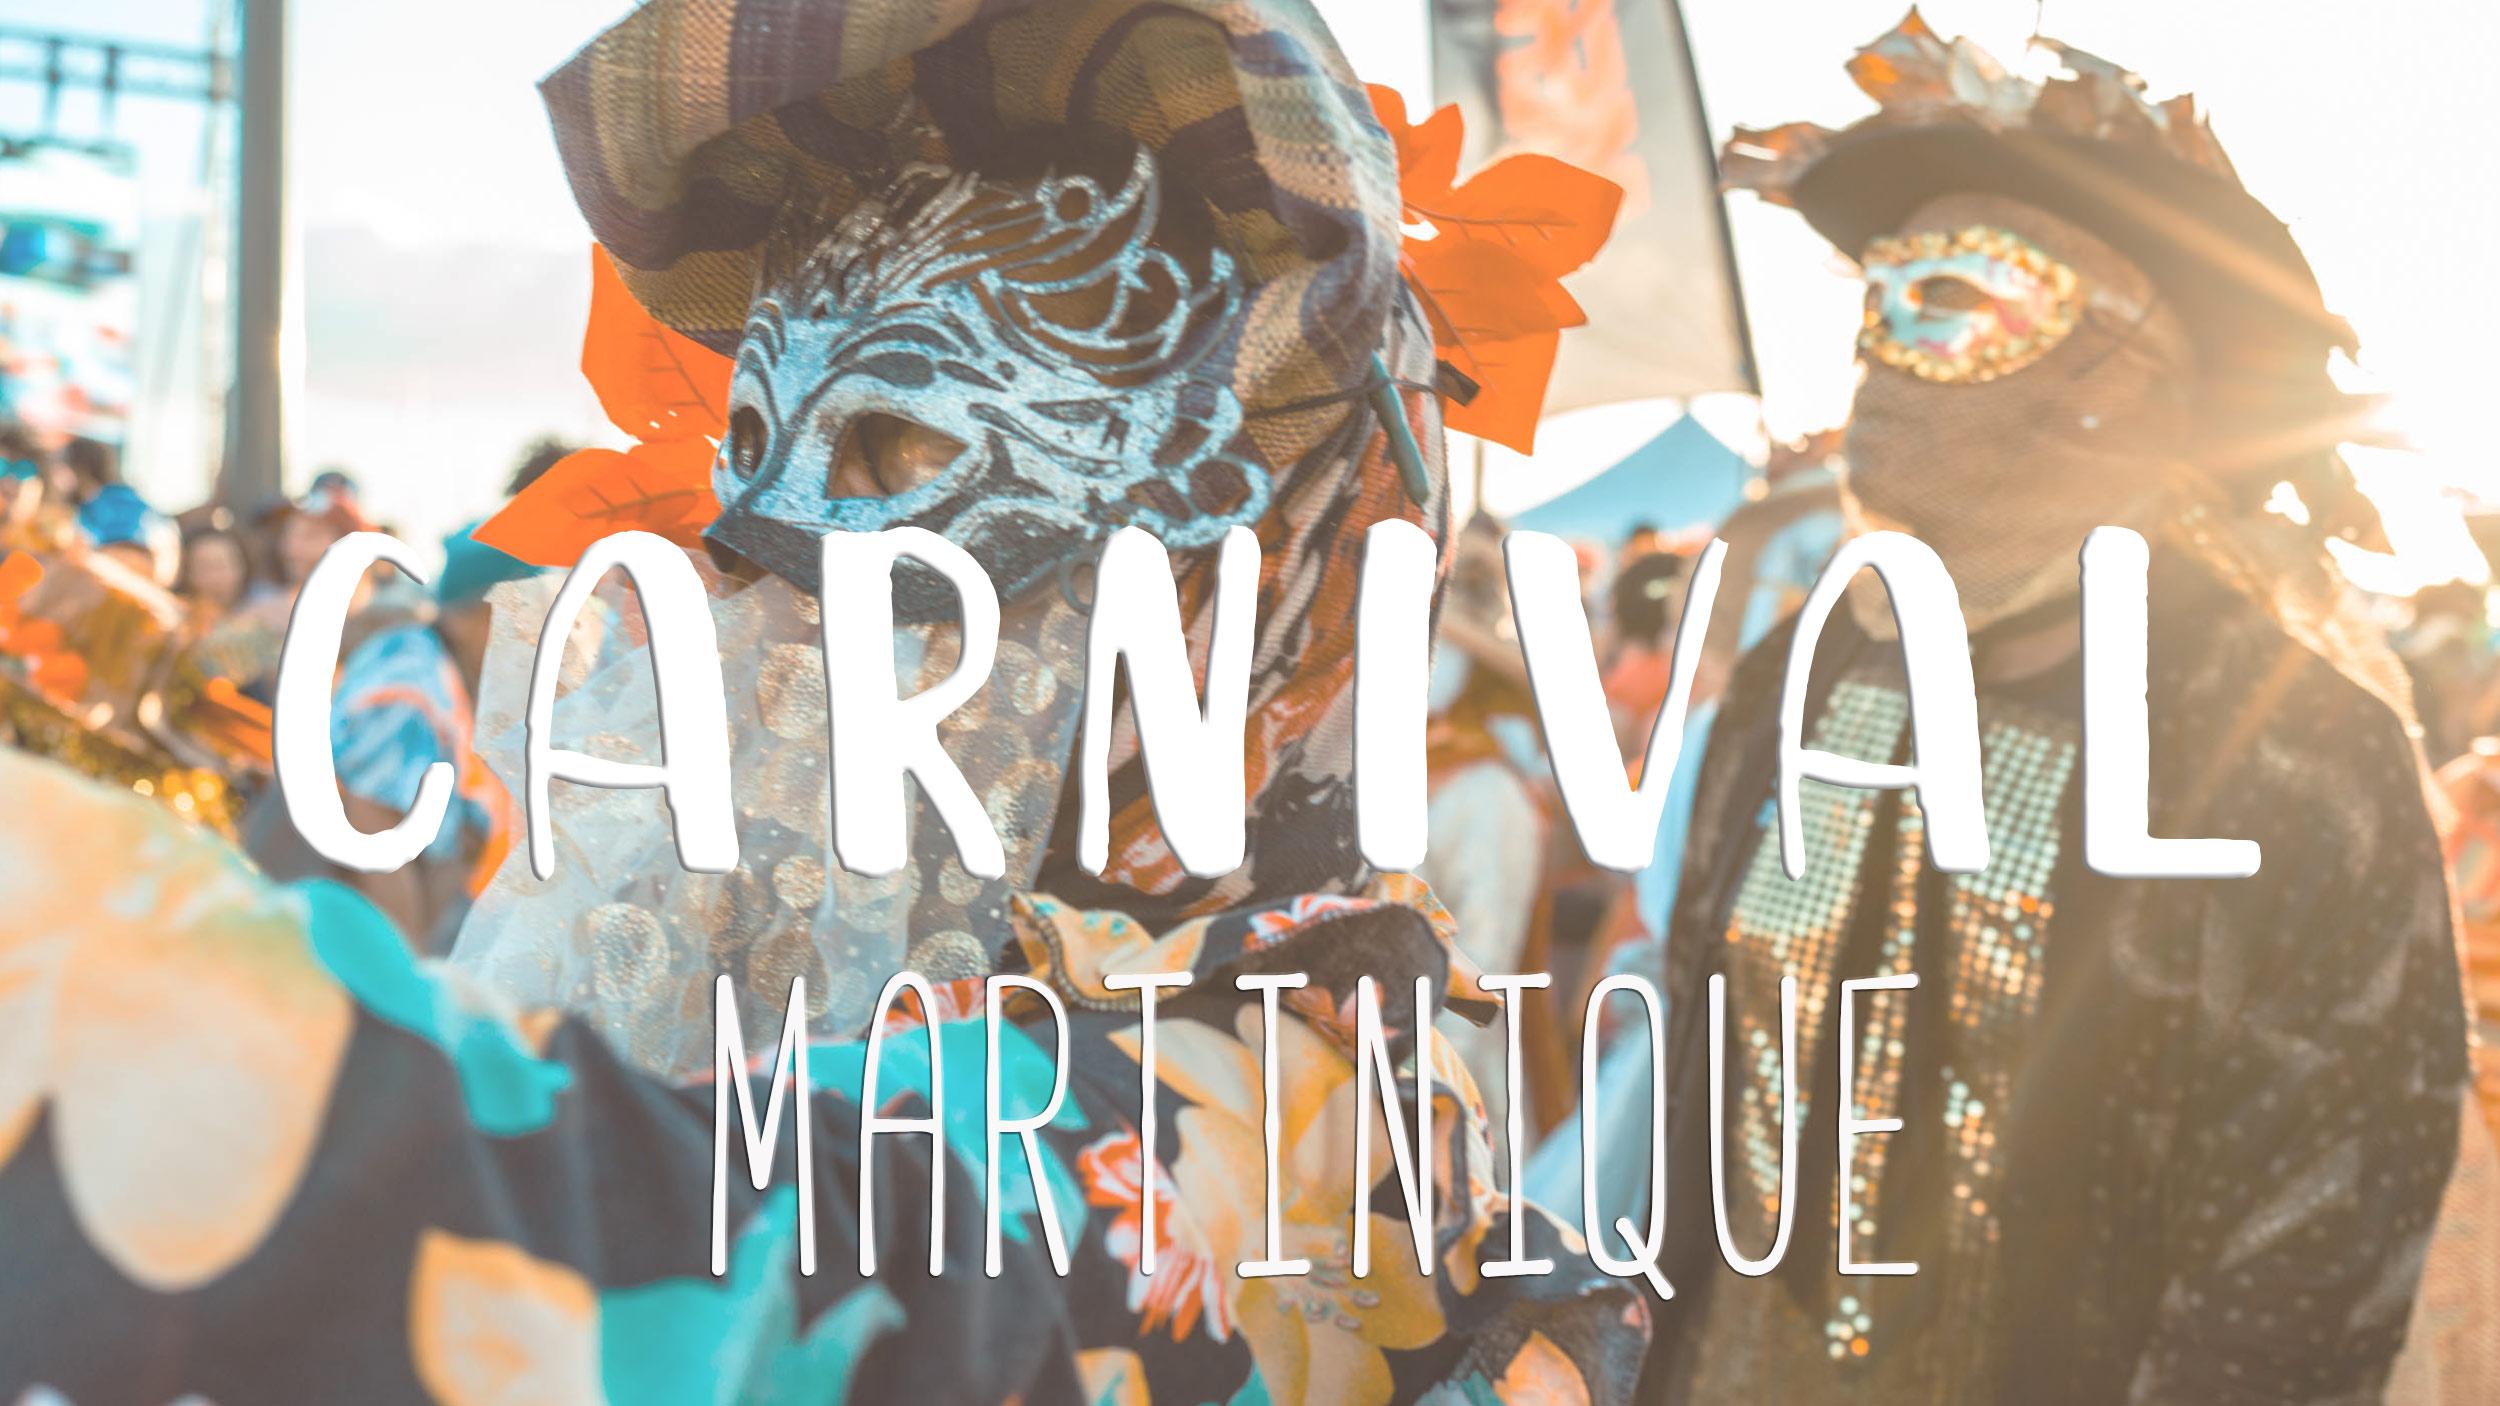 Martinique-Carnival-Website.jpg